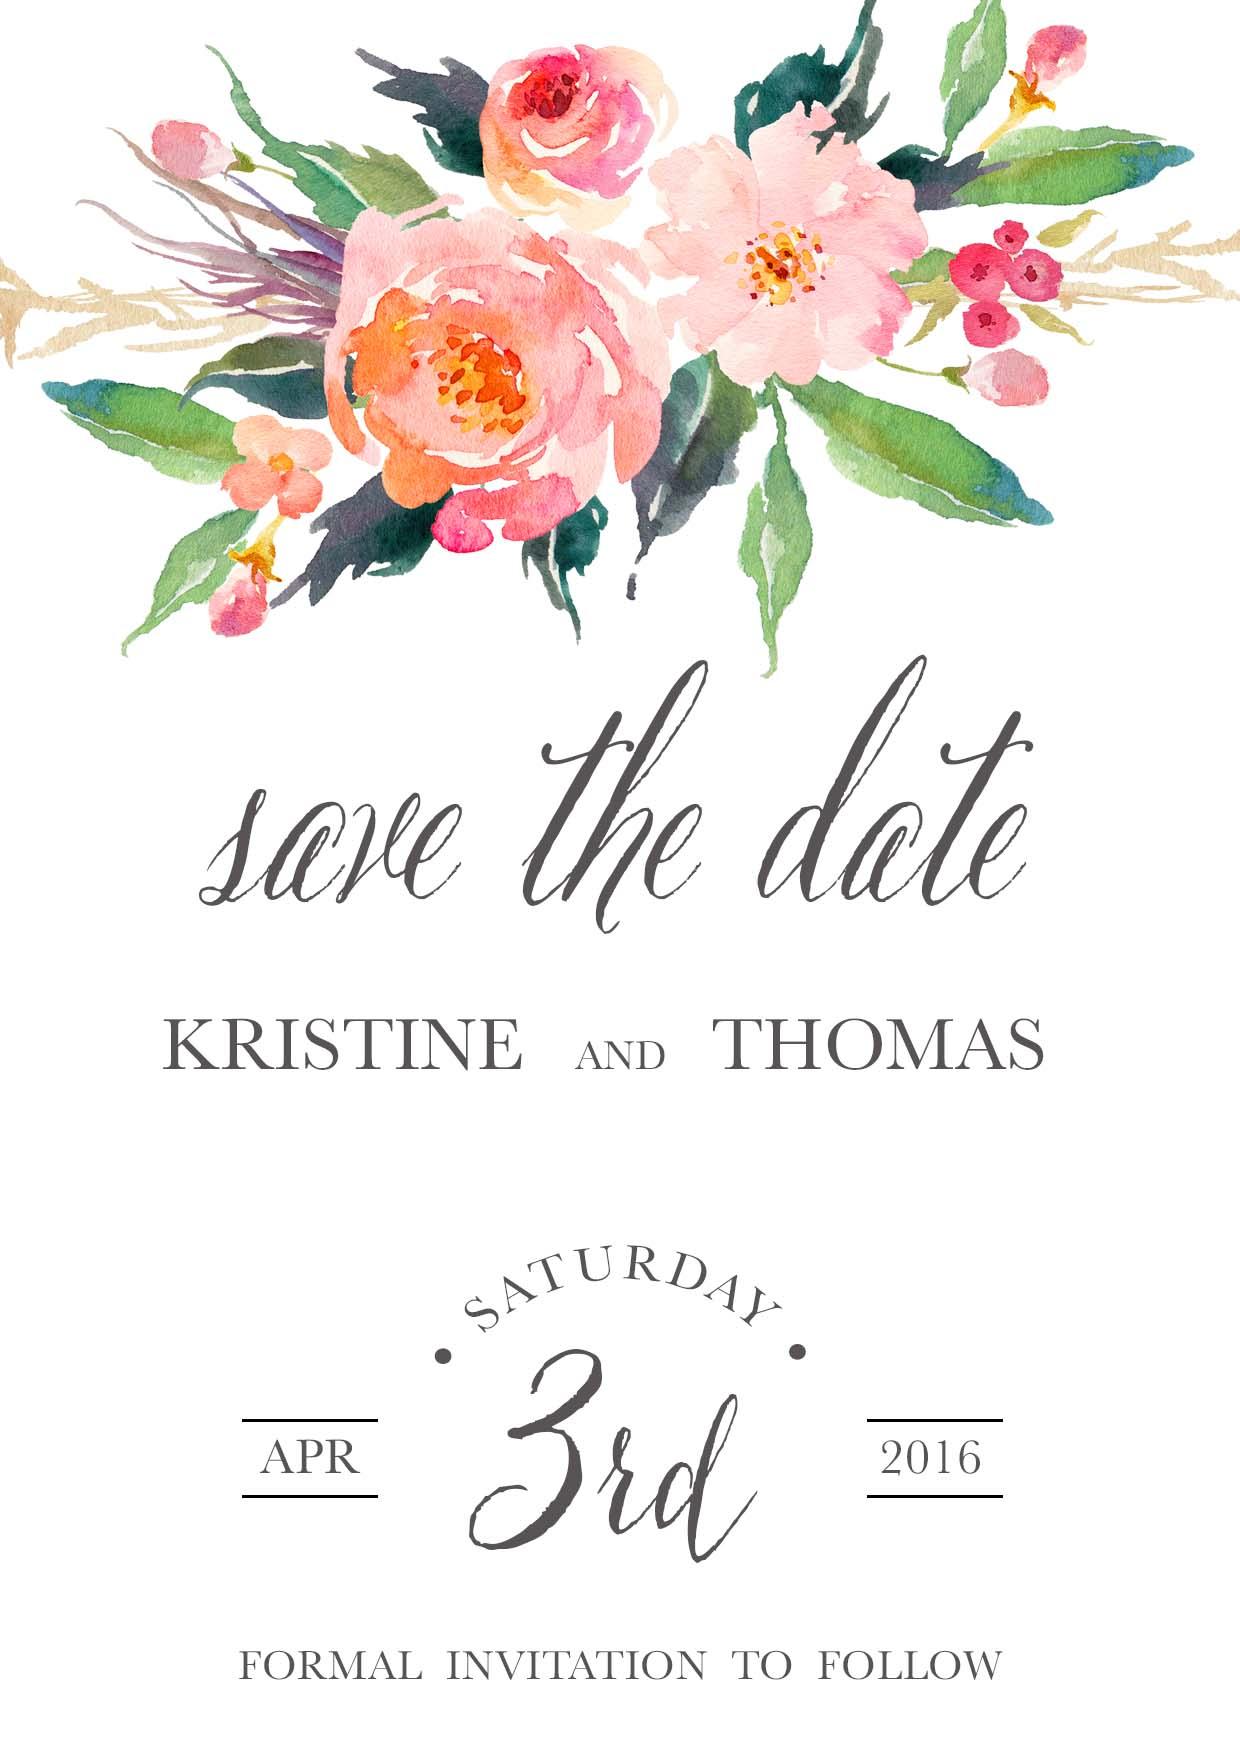 Kristine & Thomas STD.jpg